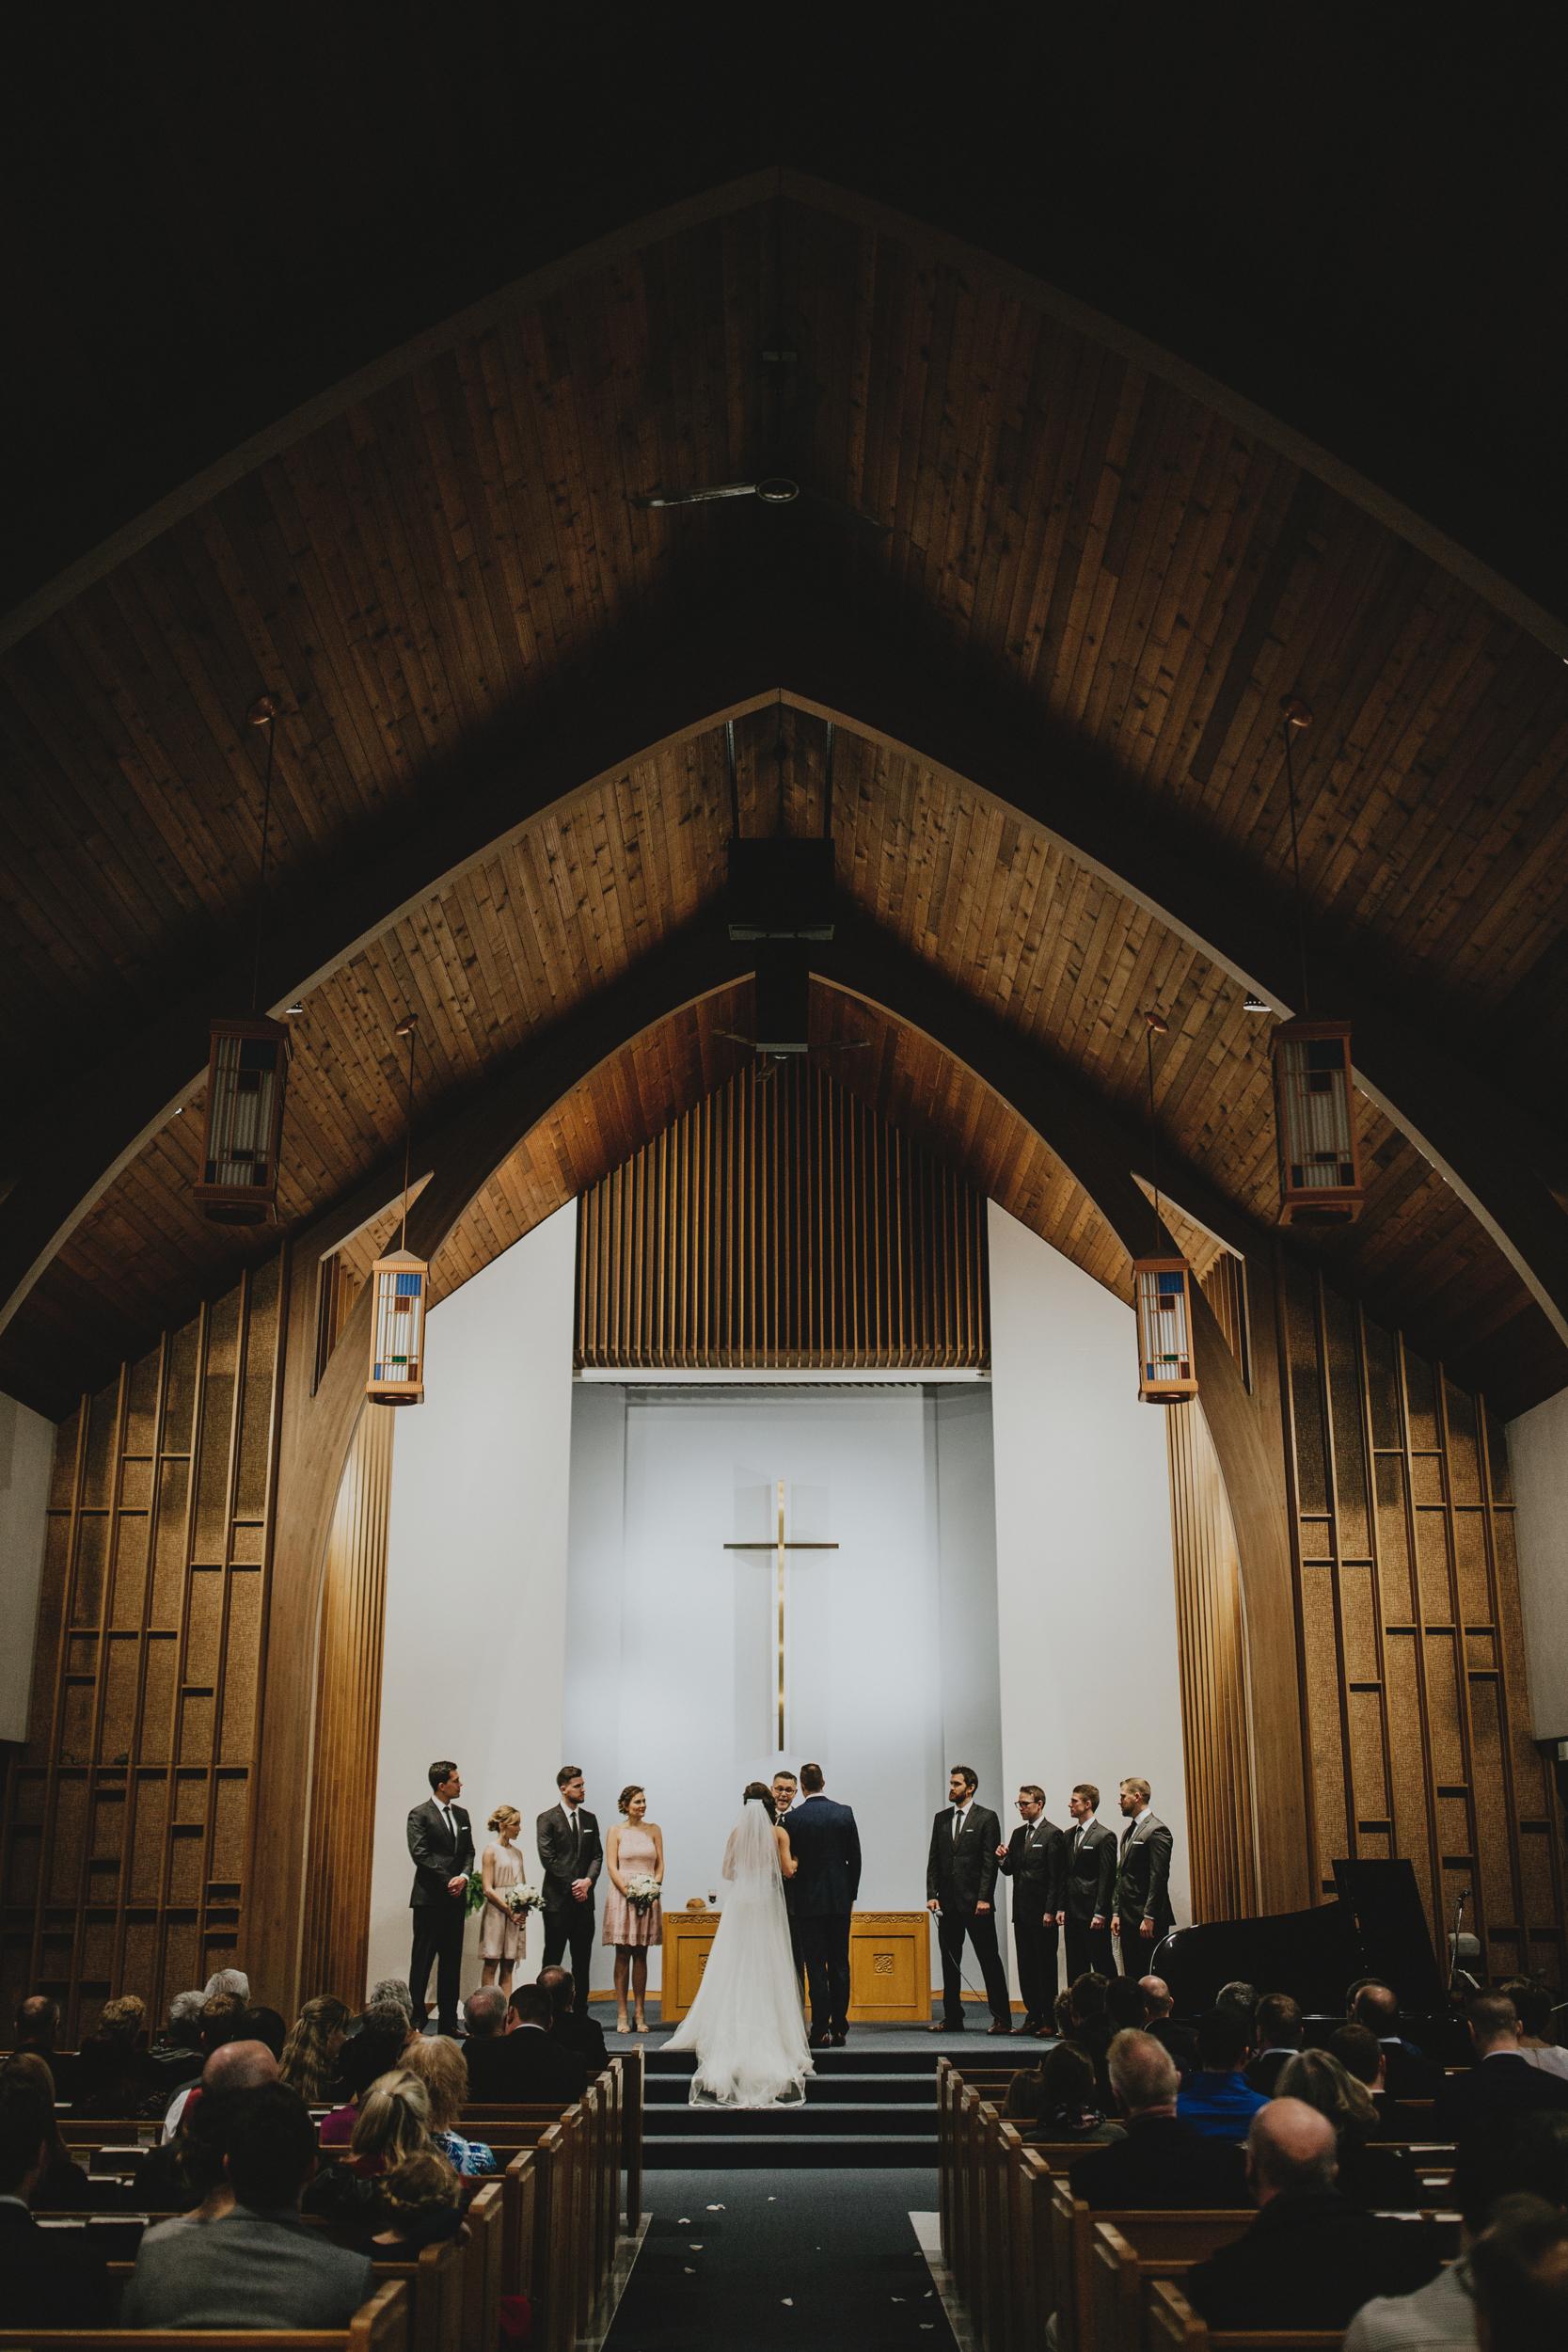 Vancouver-Church-Ceremony-Wedding-1.jpg